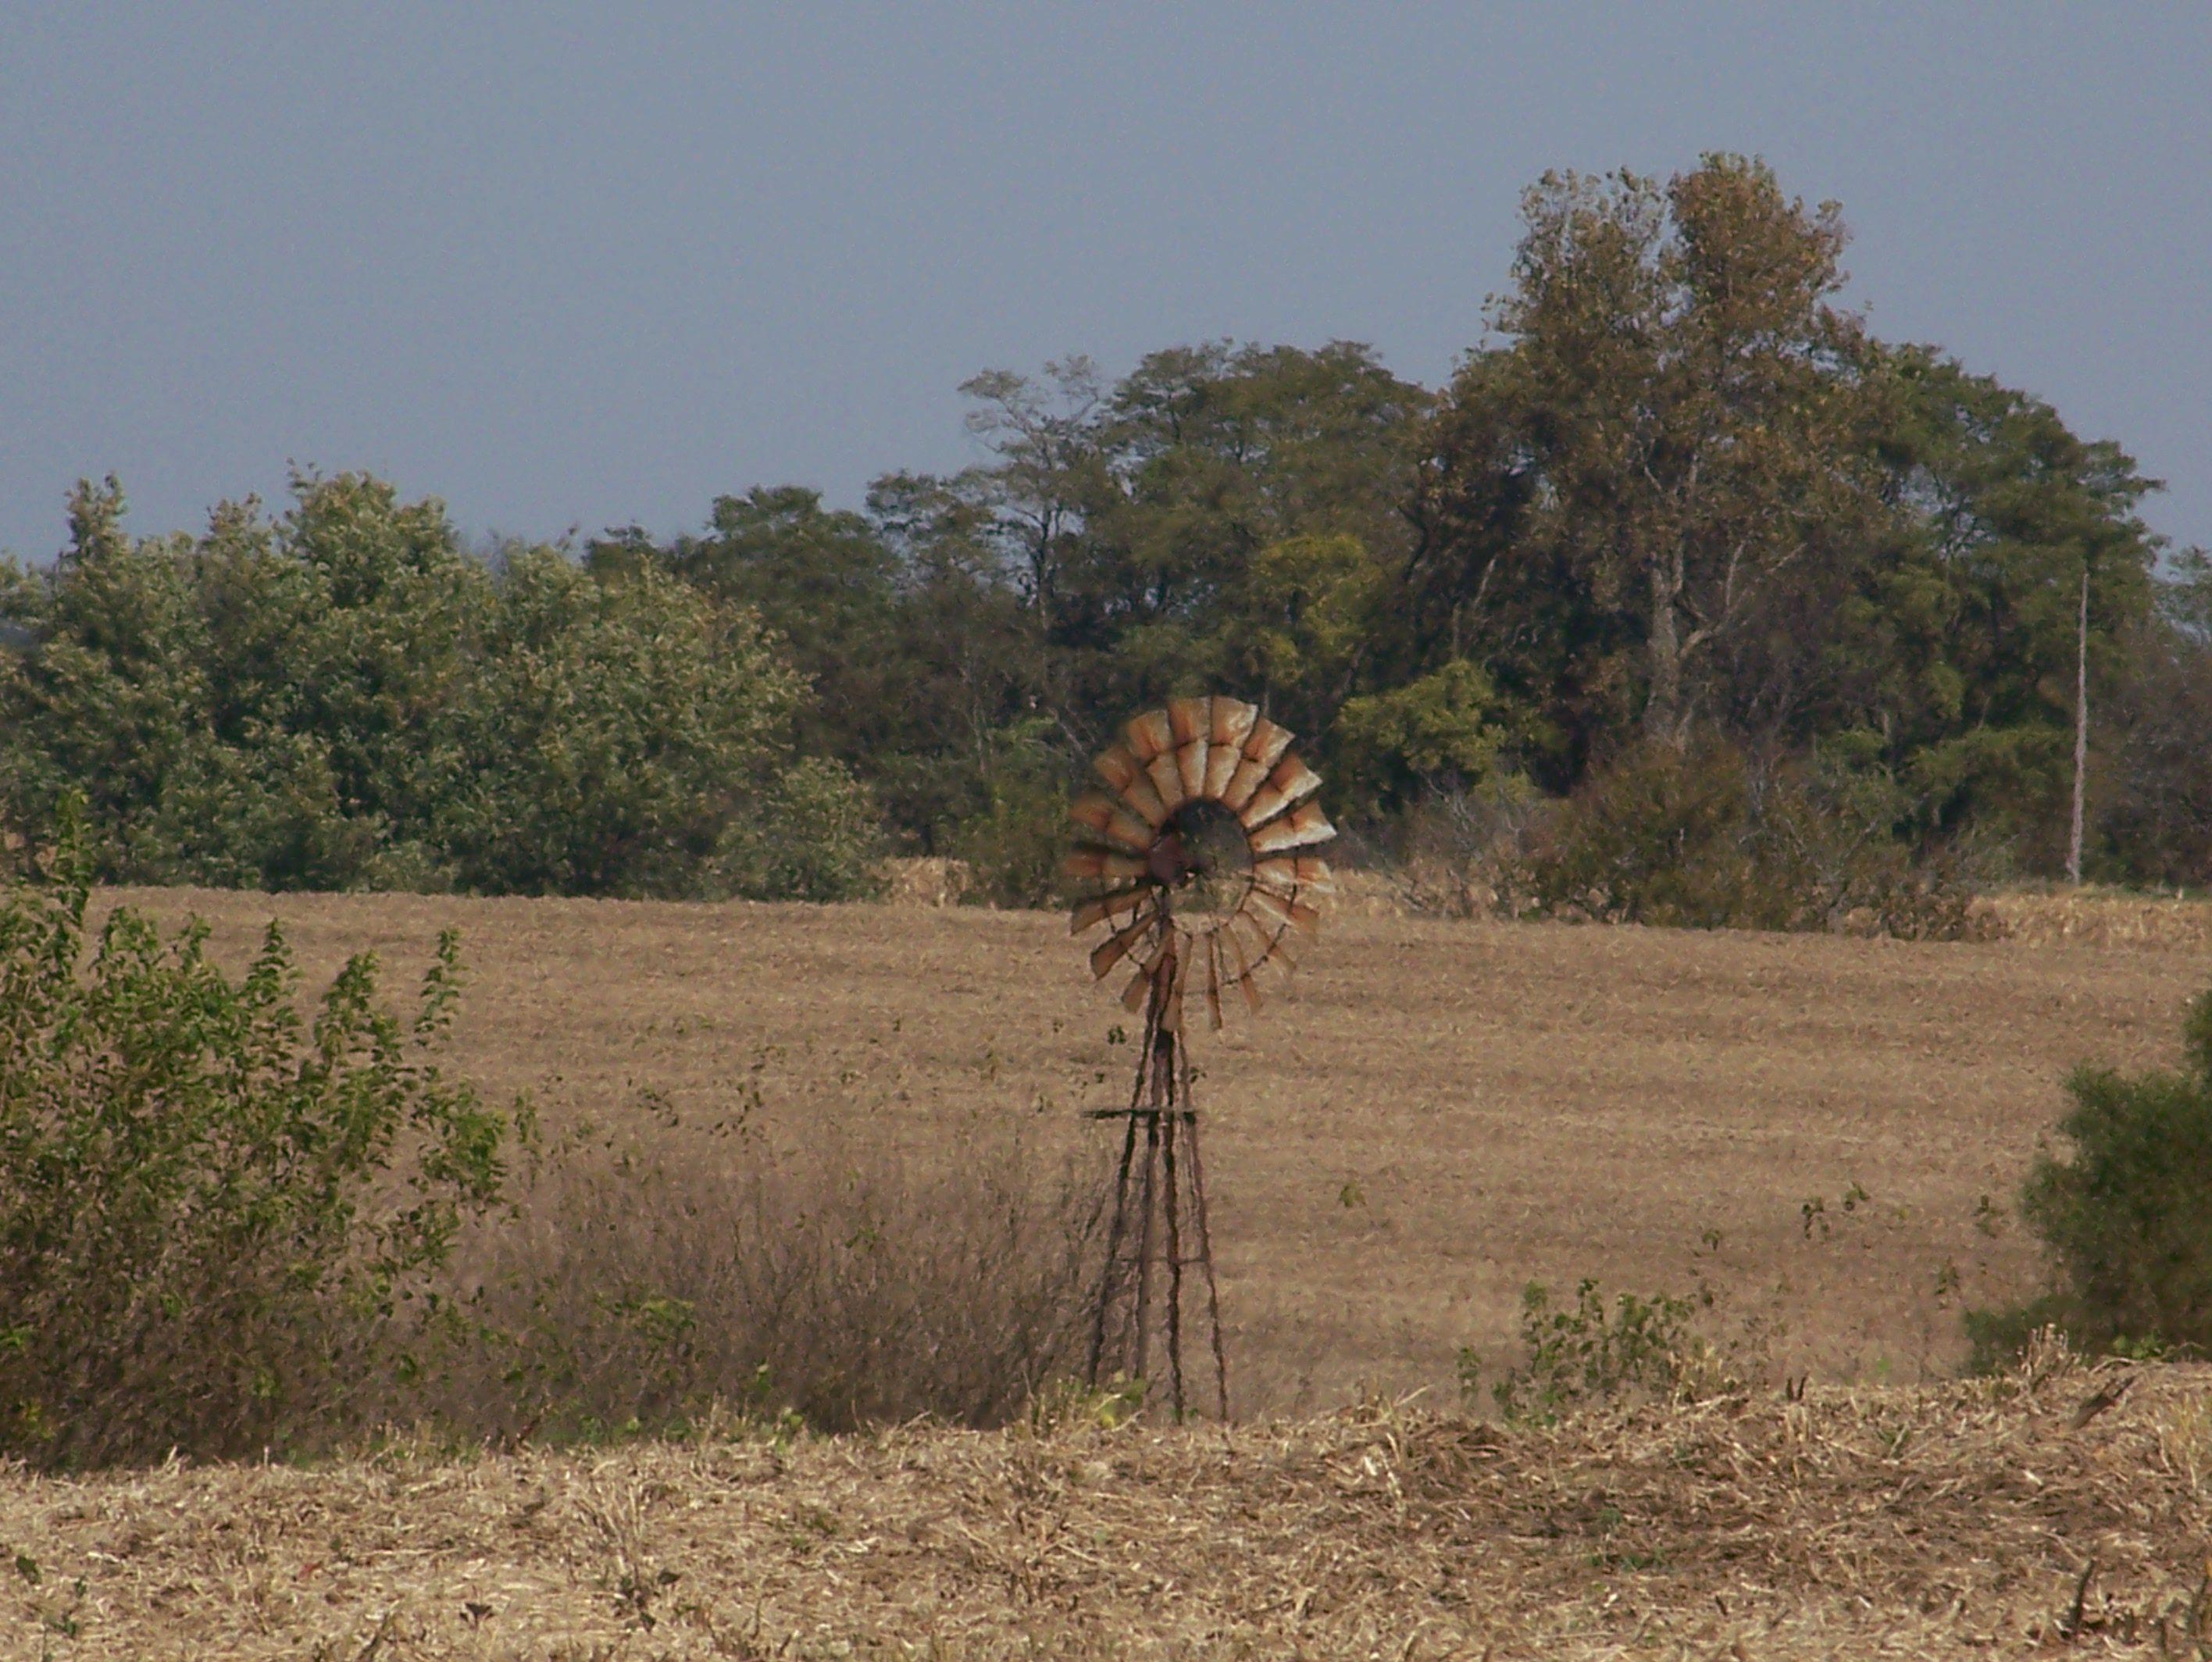 Windmill near Chandlerville, Illinois Cass county